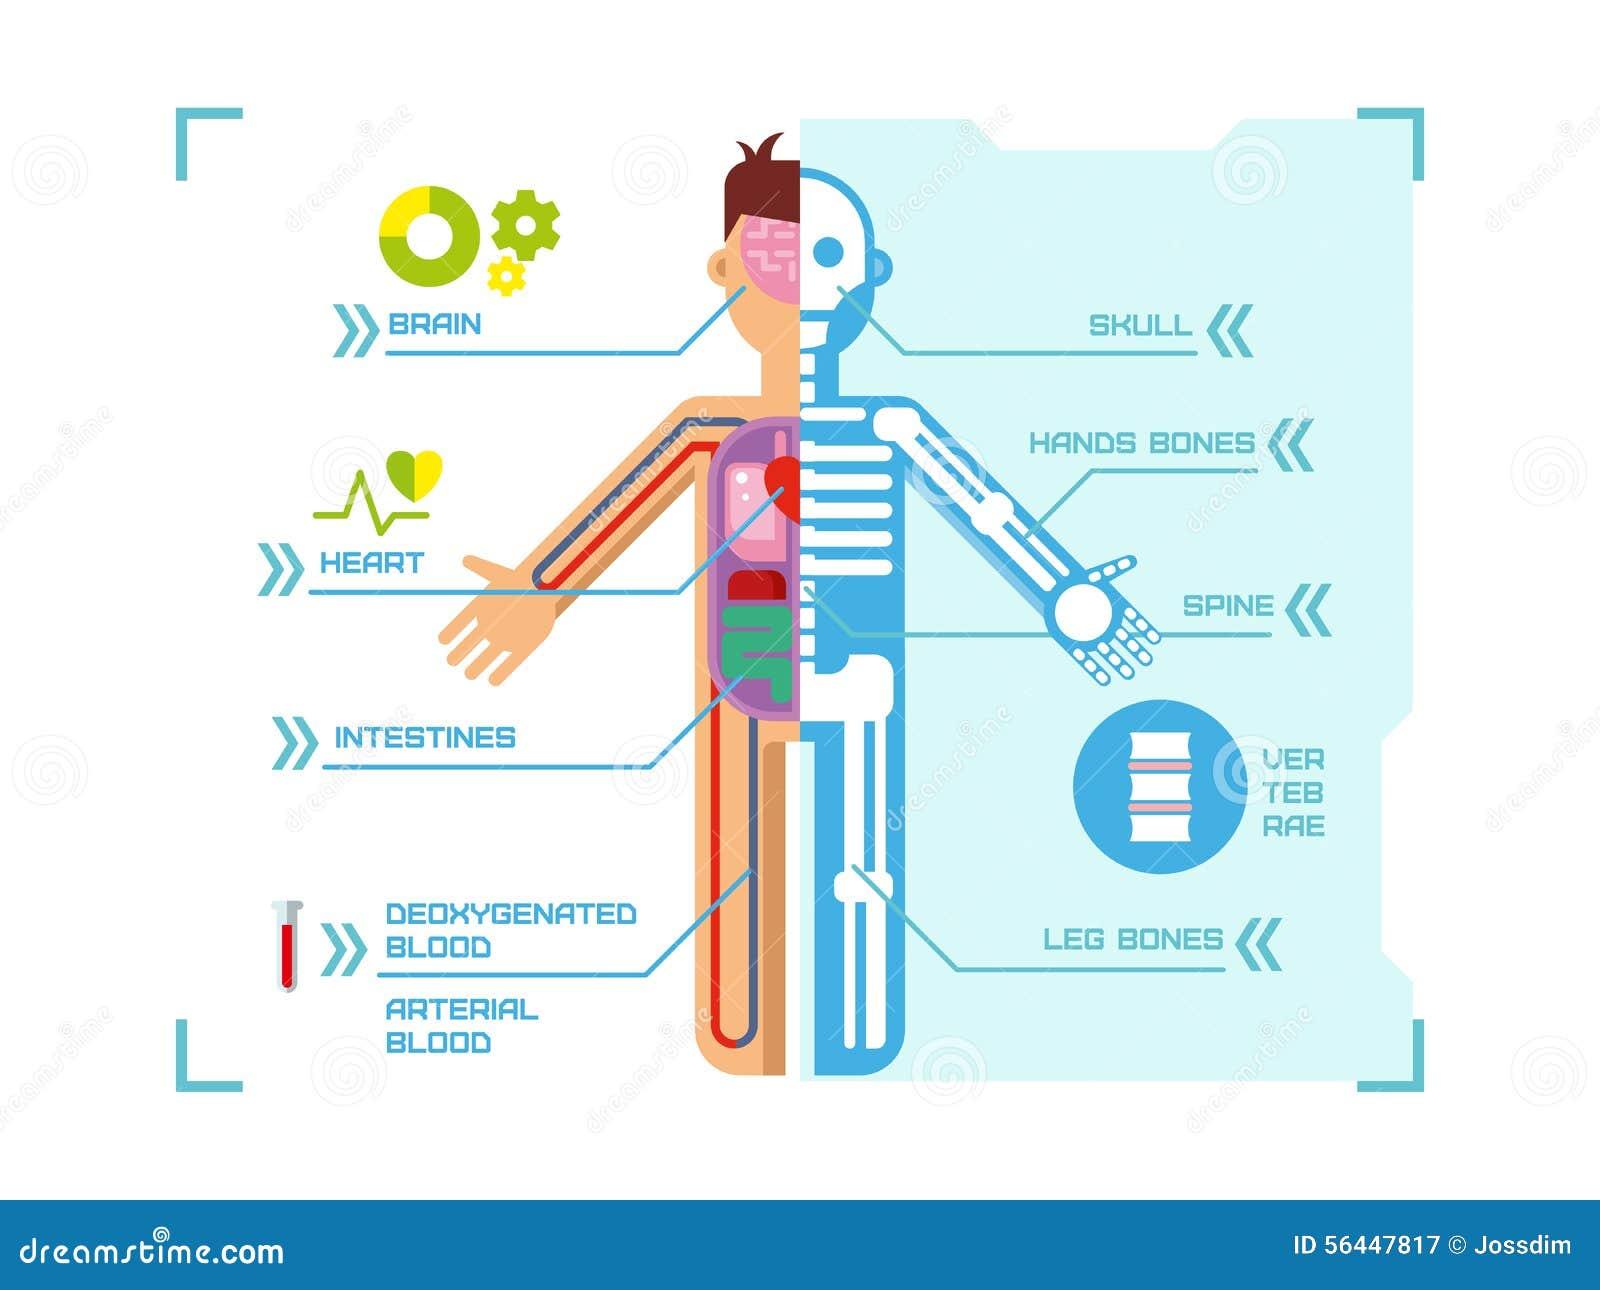 anatomy of human body pdf free download